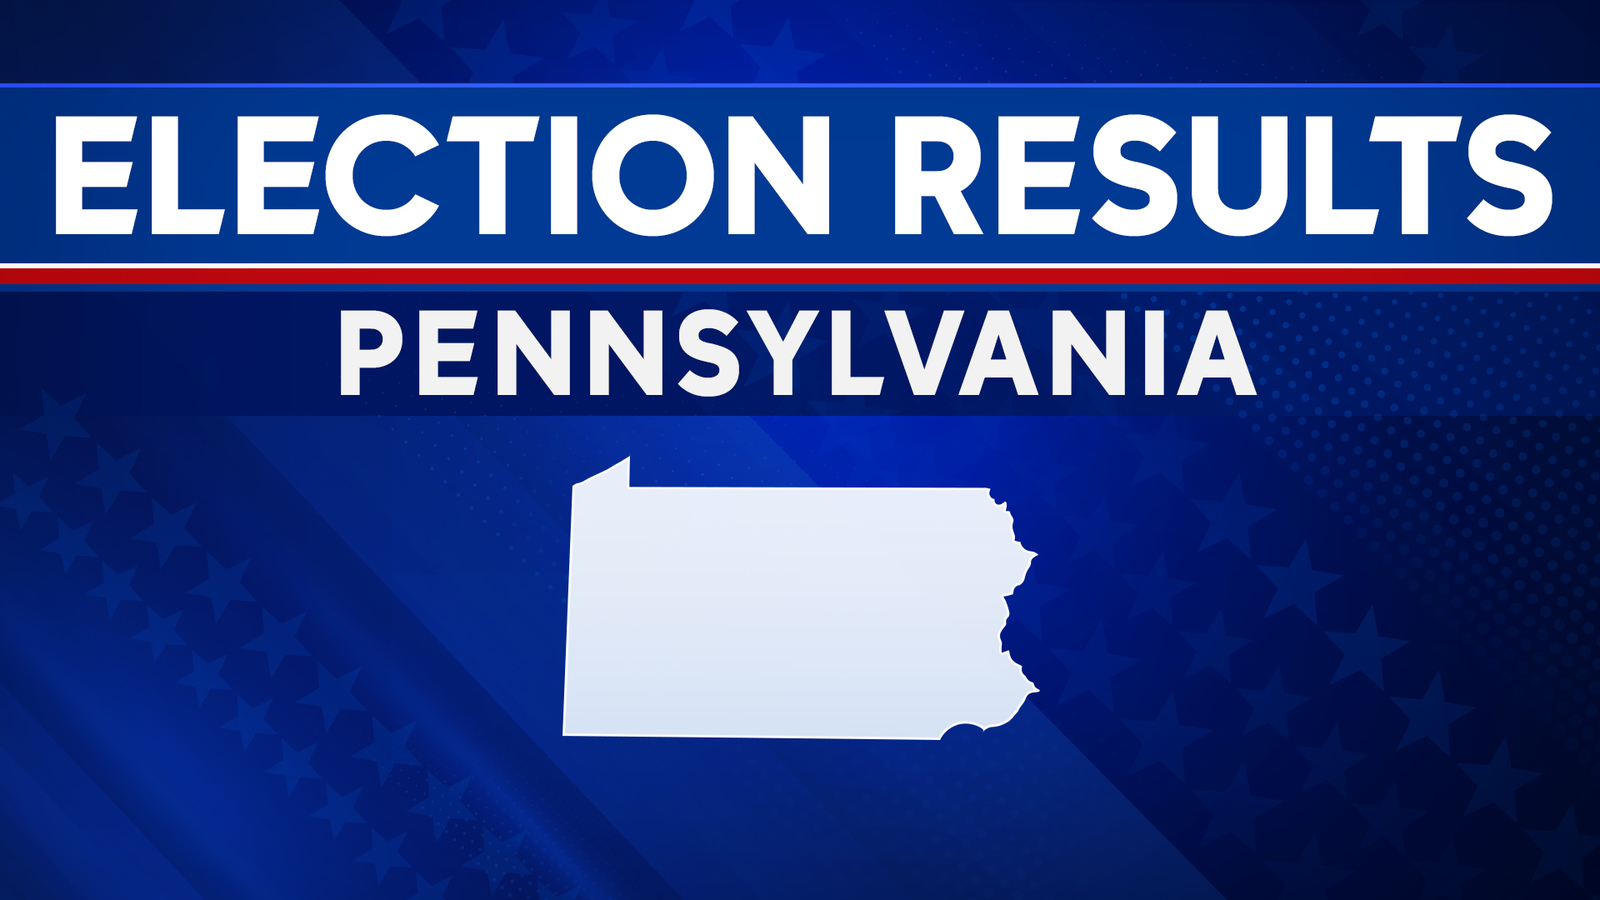 2020 Election Results: Eyes on Pennsylvania ballots in Trump, Biden presidential race